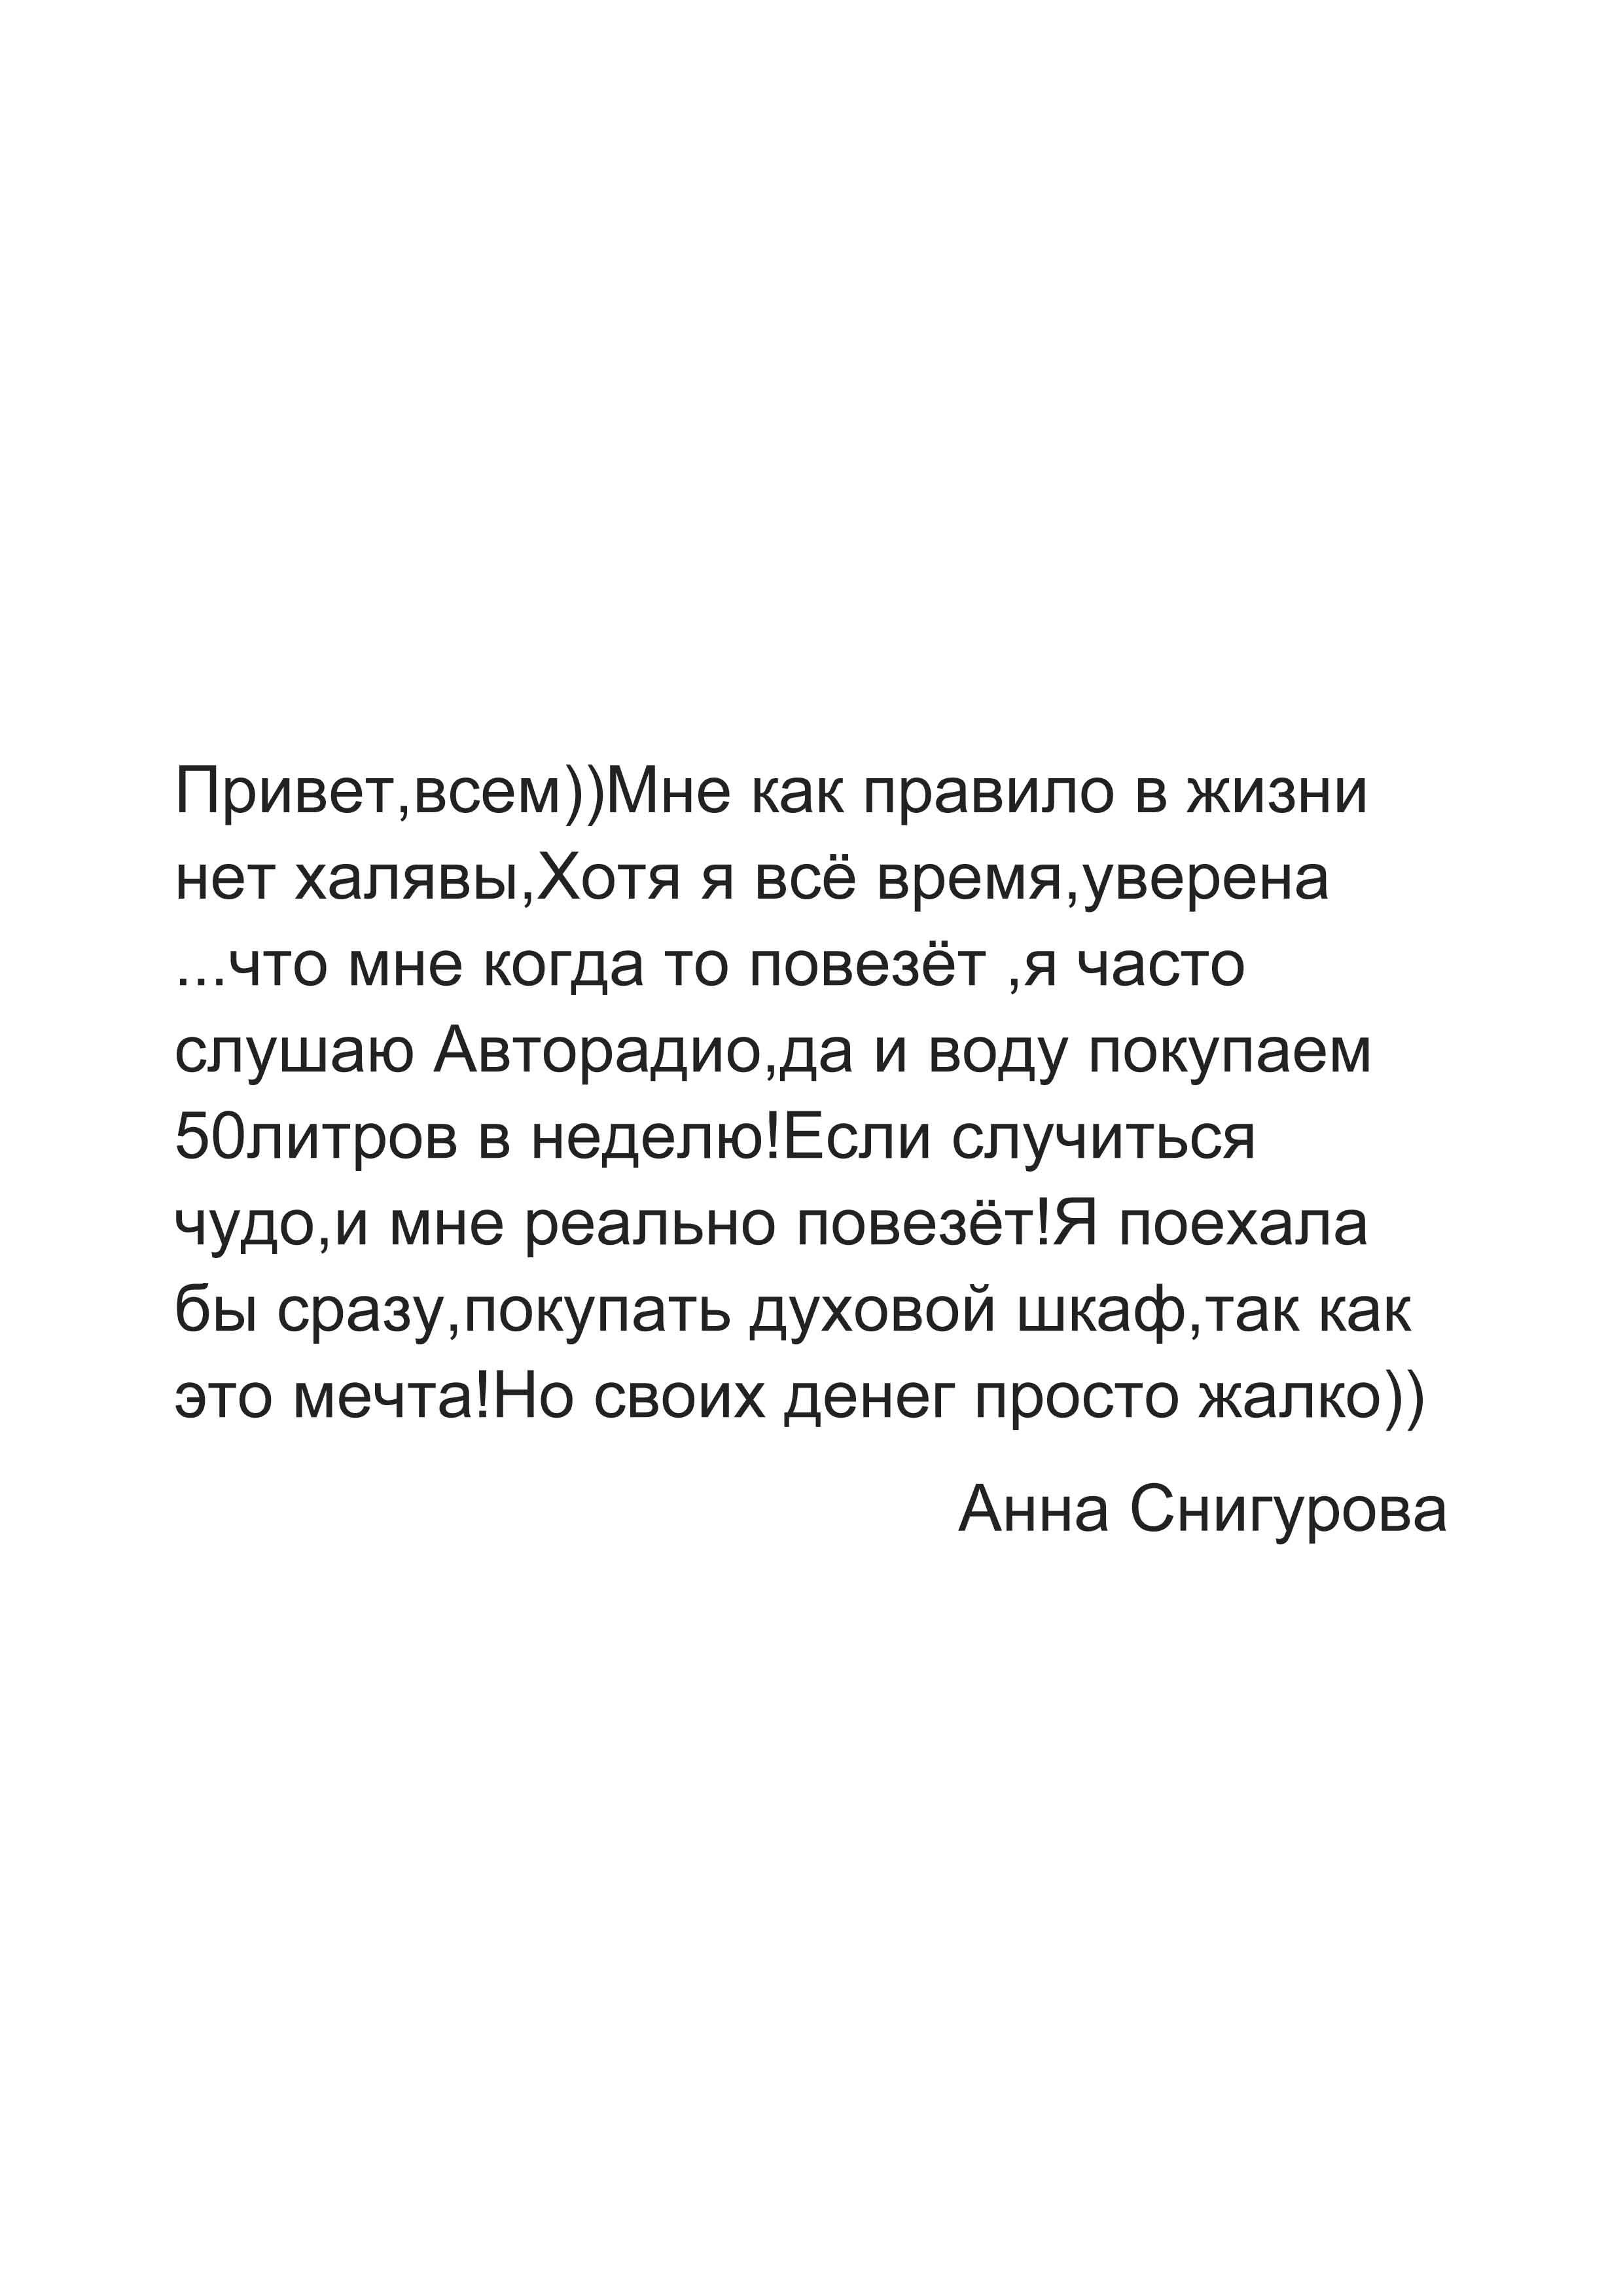 Анна Снигурова